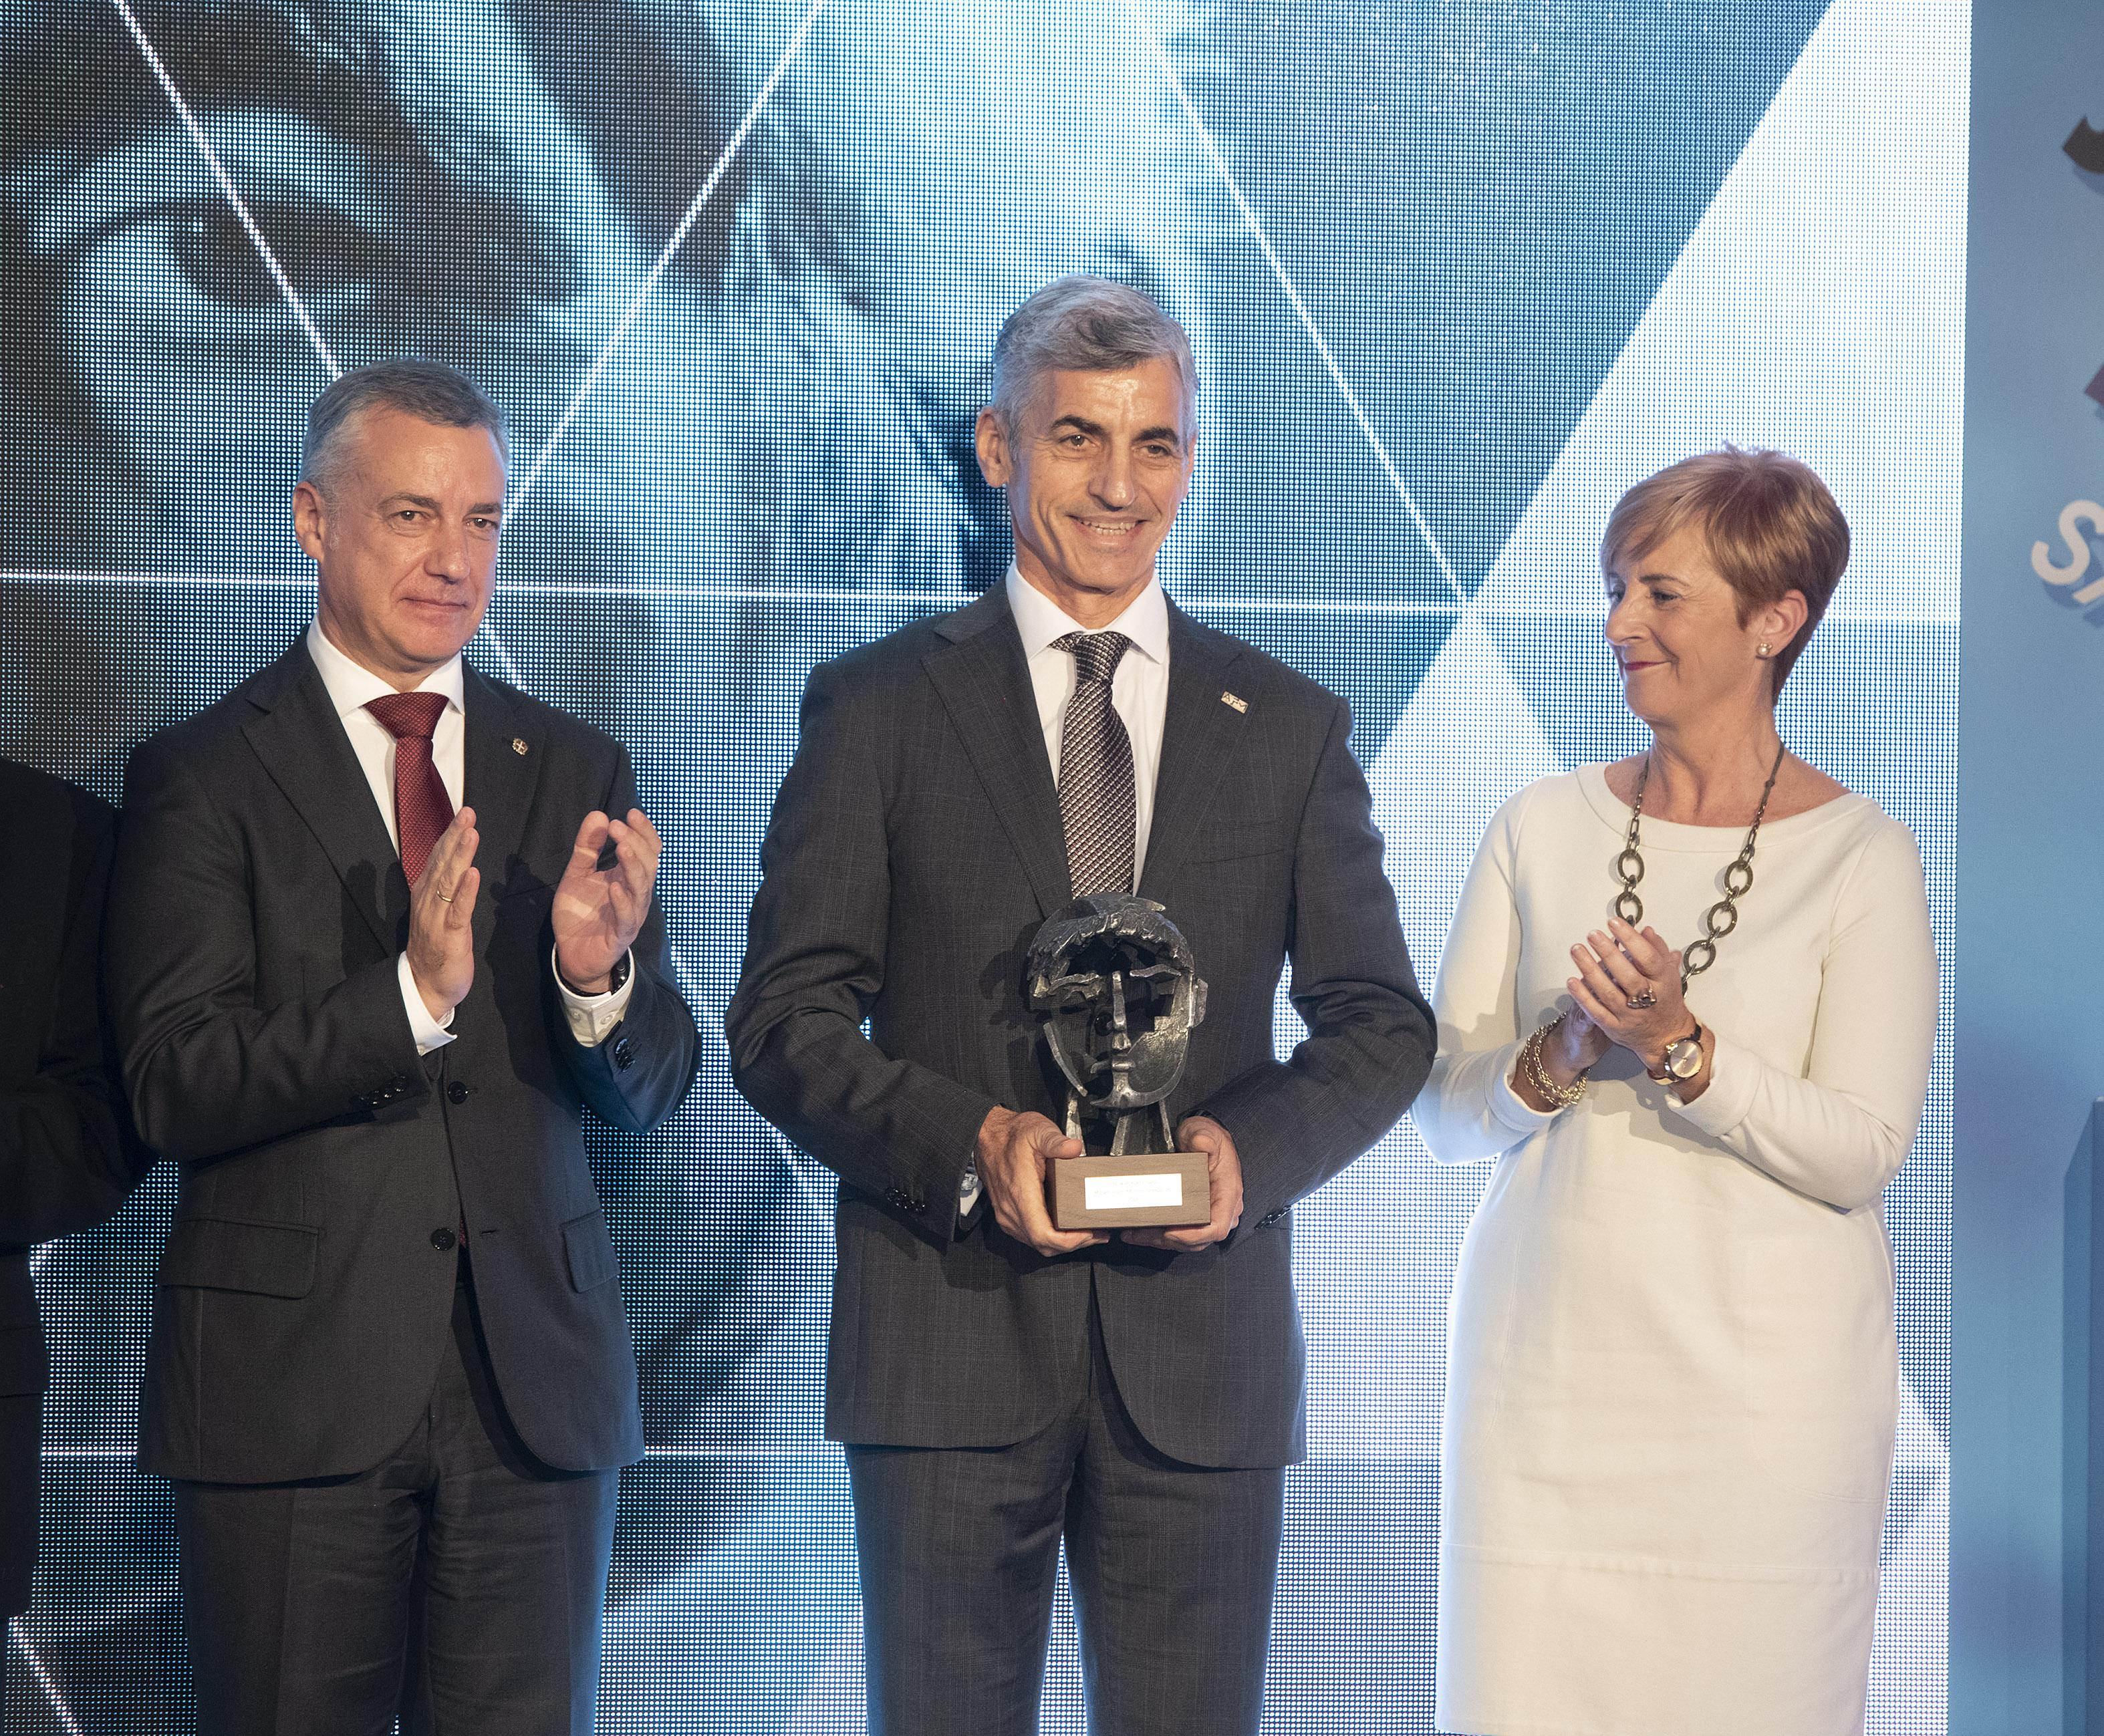 Miguel Ángel Montes Crespo (Cometel). Premios Joxe Mari Korta Sariak 2018